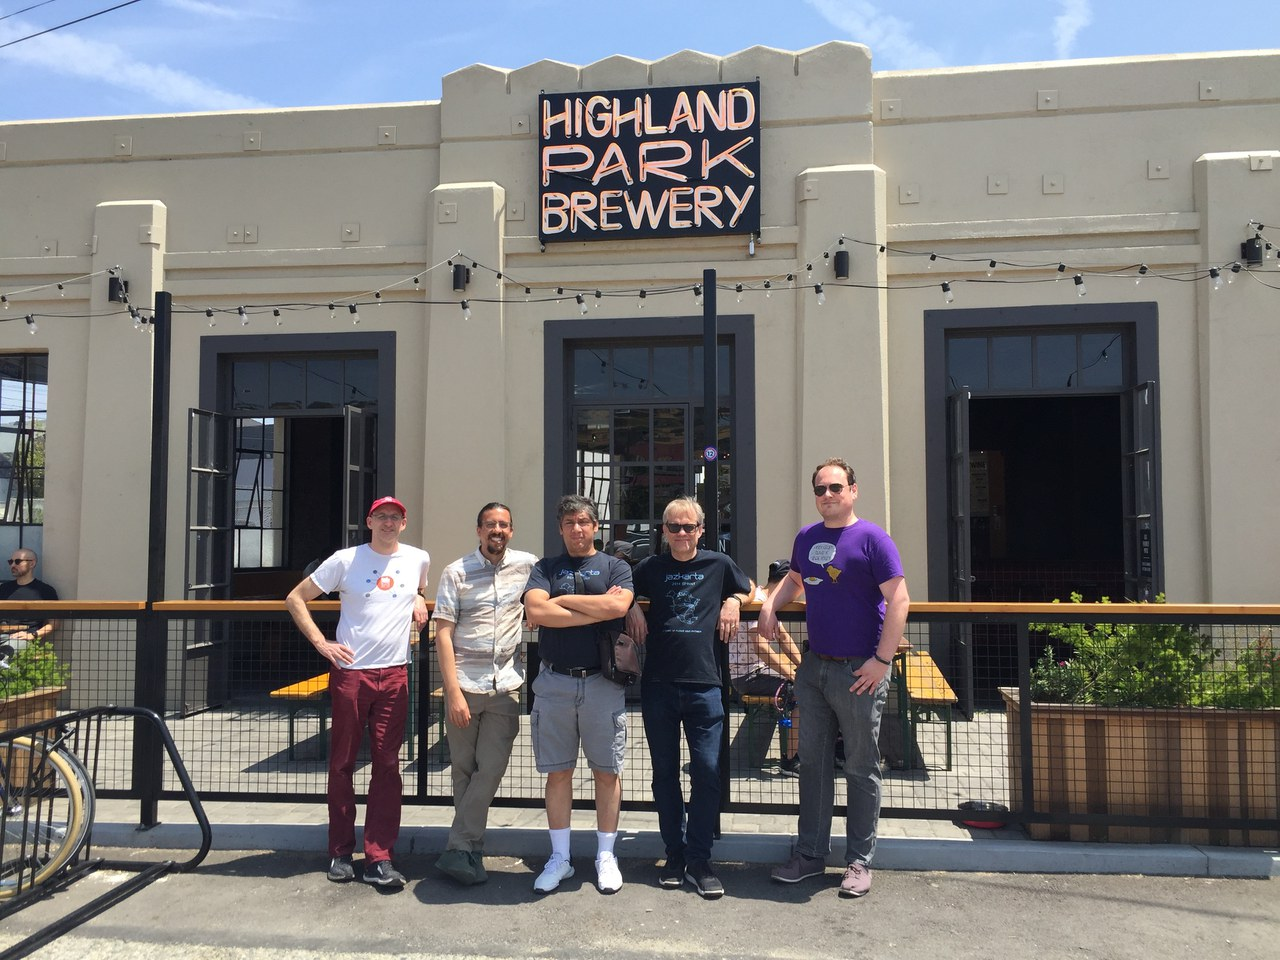 Jazkarta at Highland Park Brewery in LA